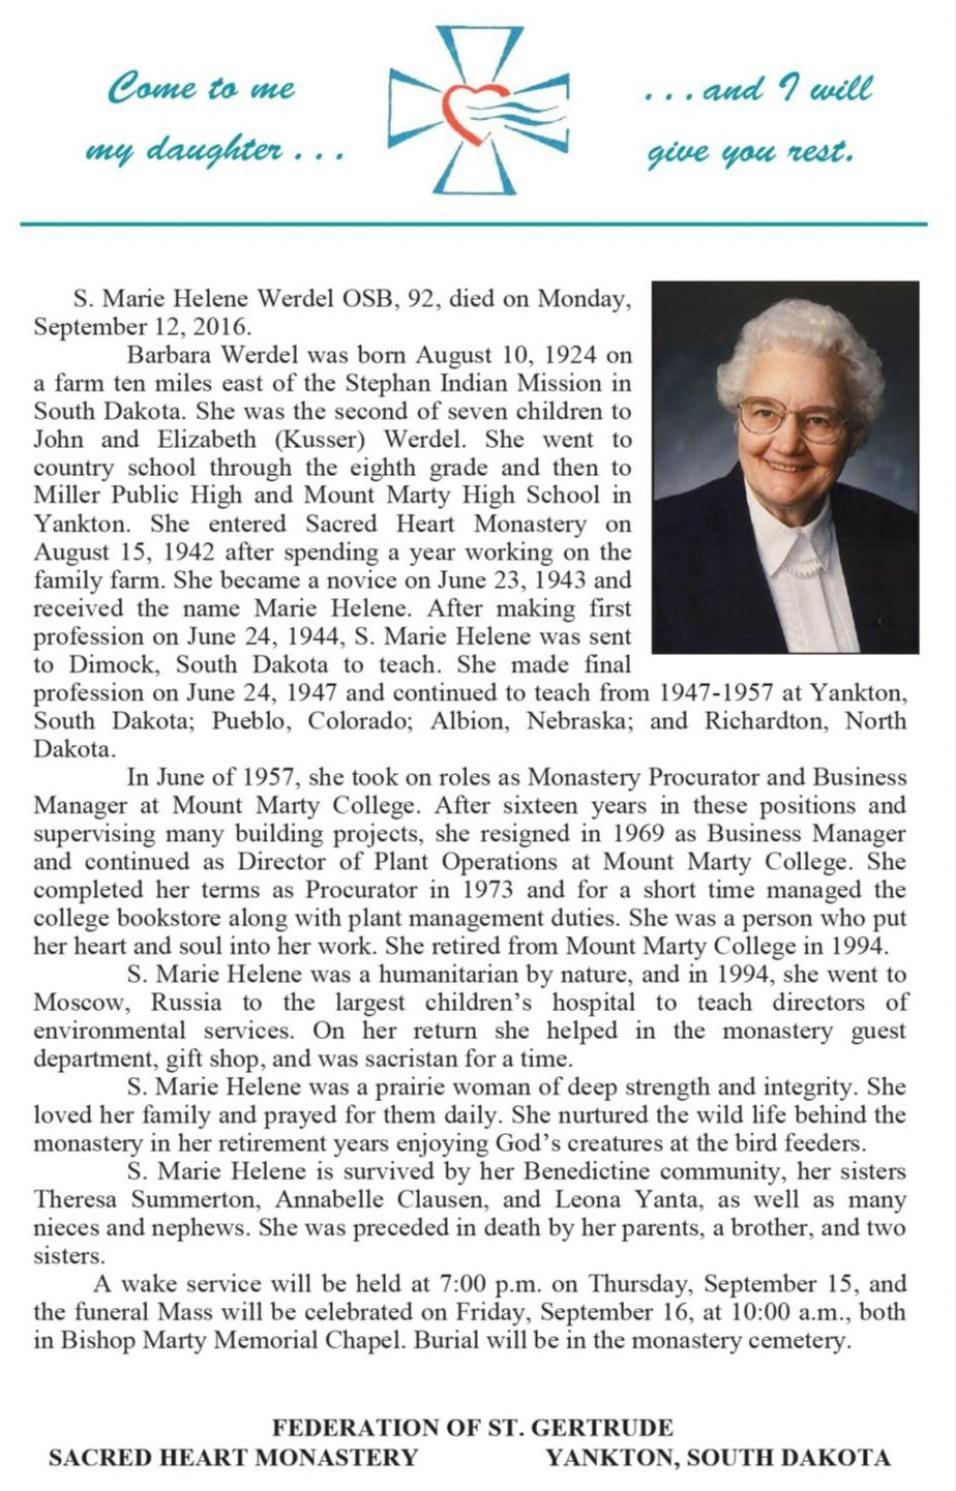 sister-marie-helene-werdel-obituary-yankton-benedictines-sacred-heart-monastery